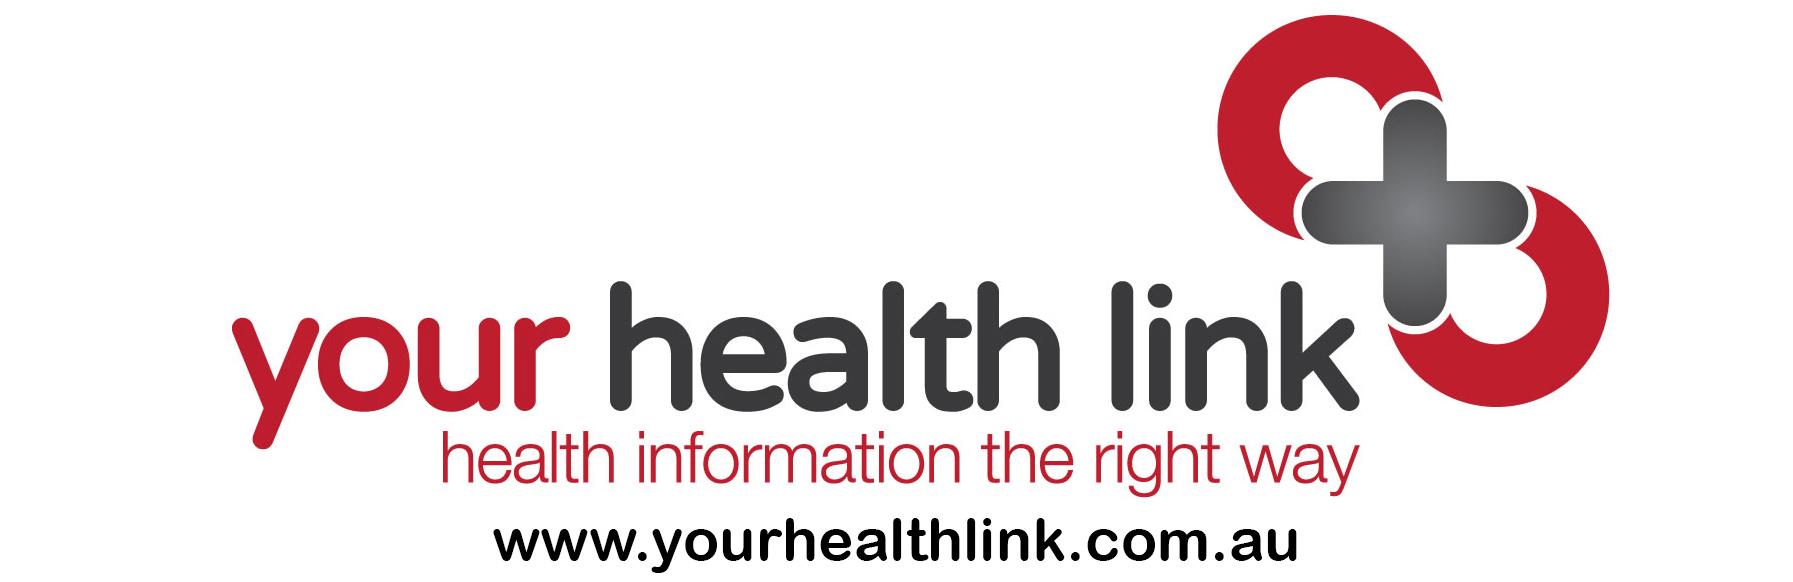 Your-Health-Link-Logo-with-website-address-2.jpg | Photo ...